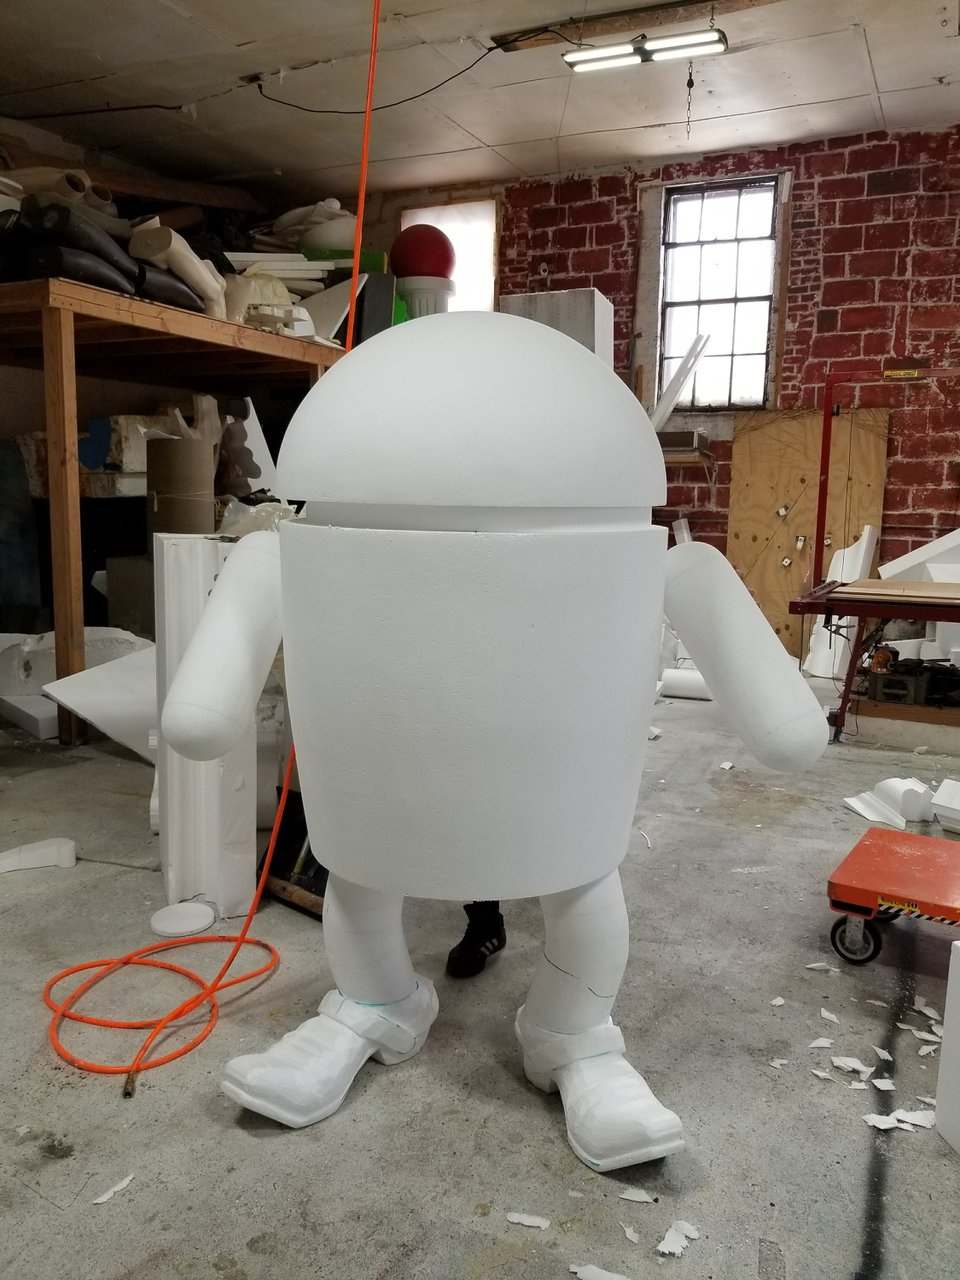 Texas Google Android photo 20170914_125805.jpg